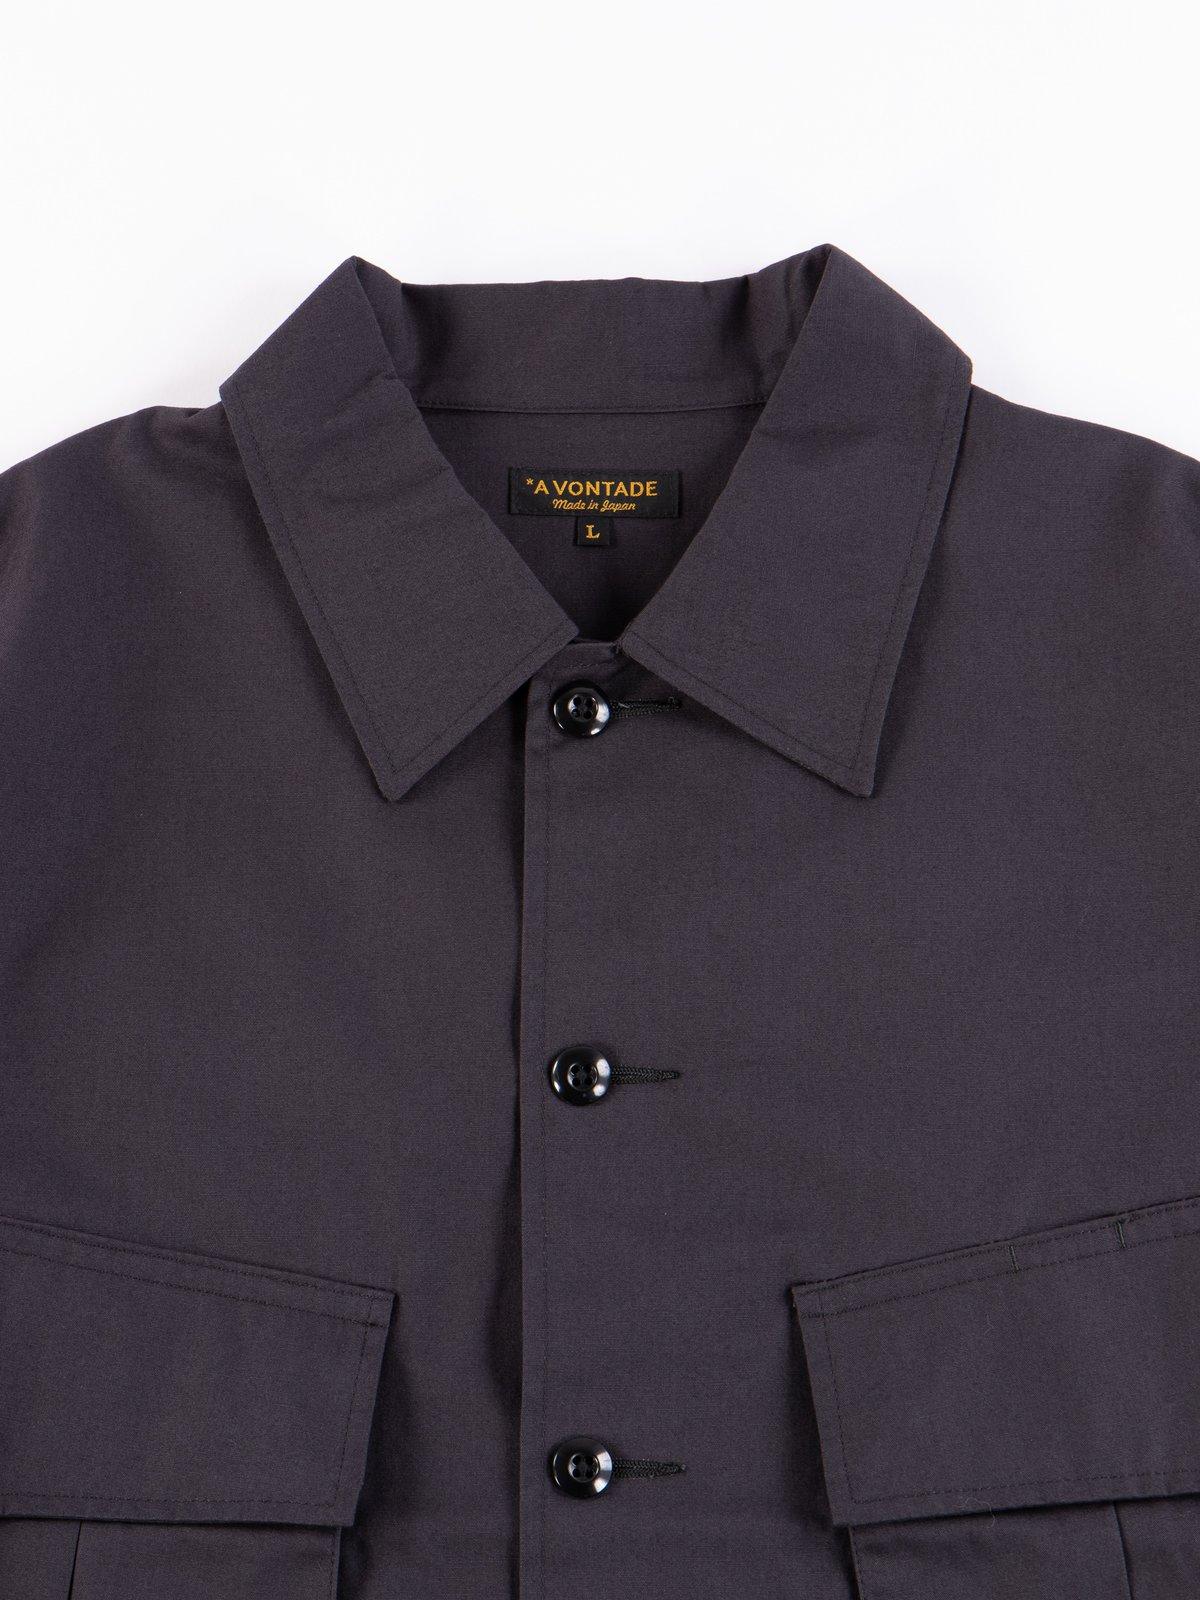 Fade Black Selvedge Poplin Cotton Combat Short Jacket - Image 3